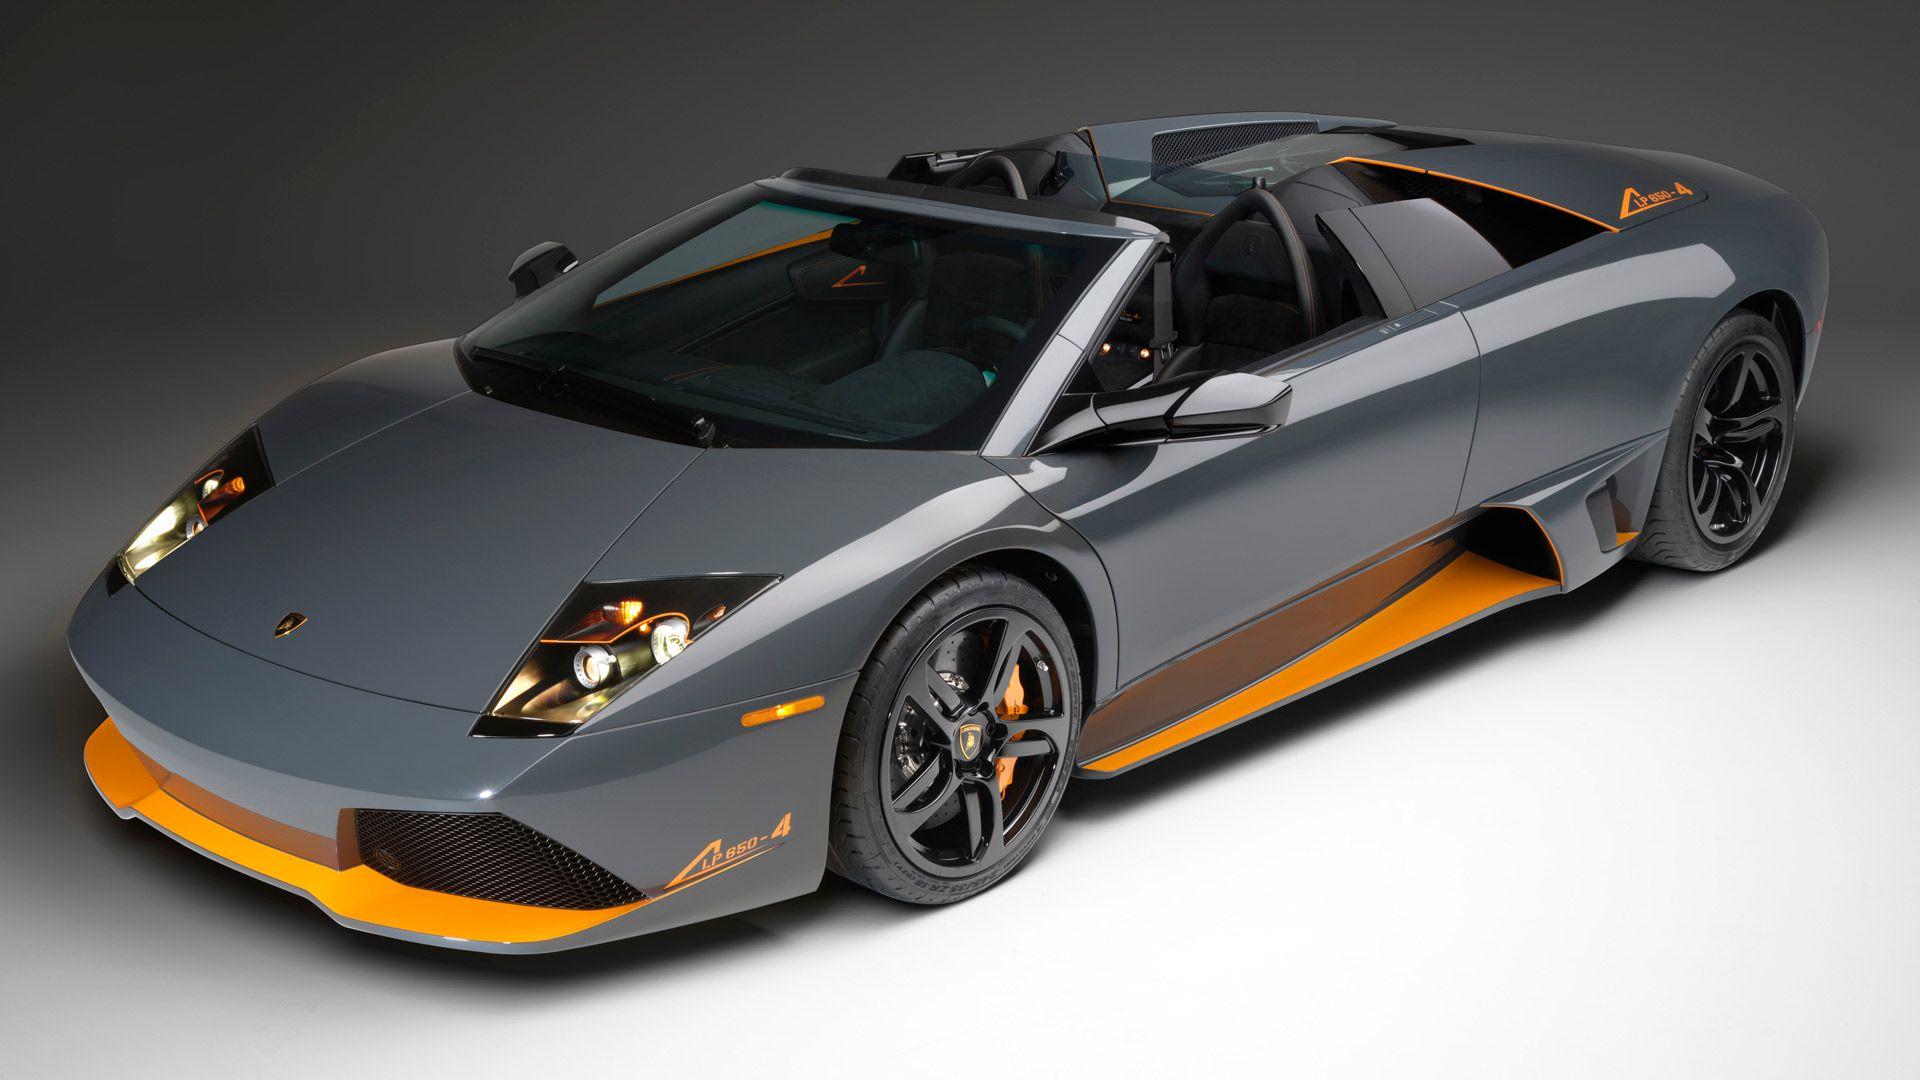 Lamborghini Murciélago | Lamborghini Wiki | Fandom Powered By Wikia